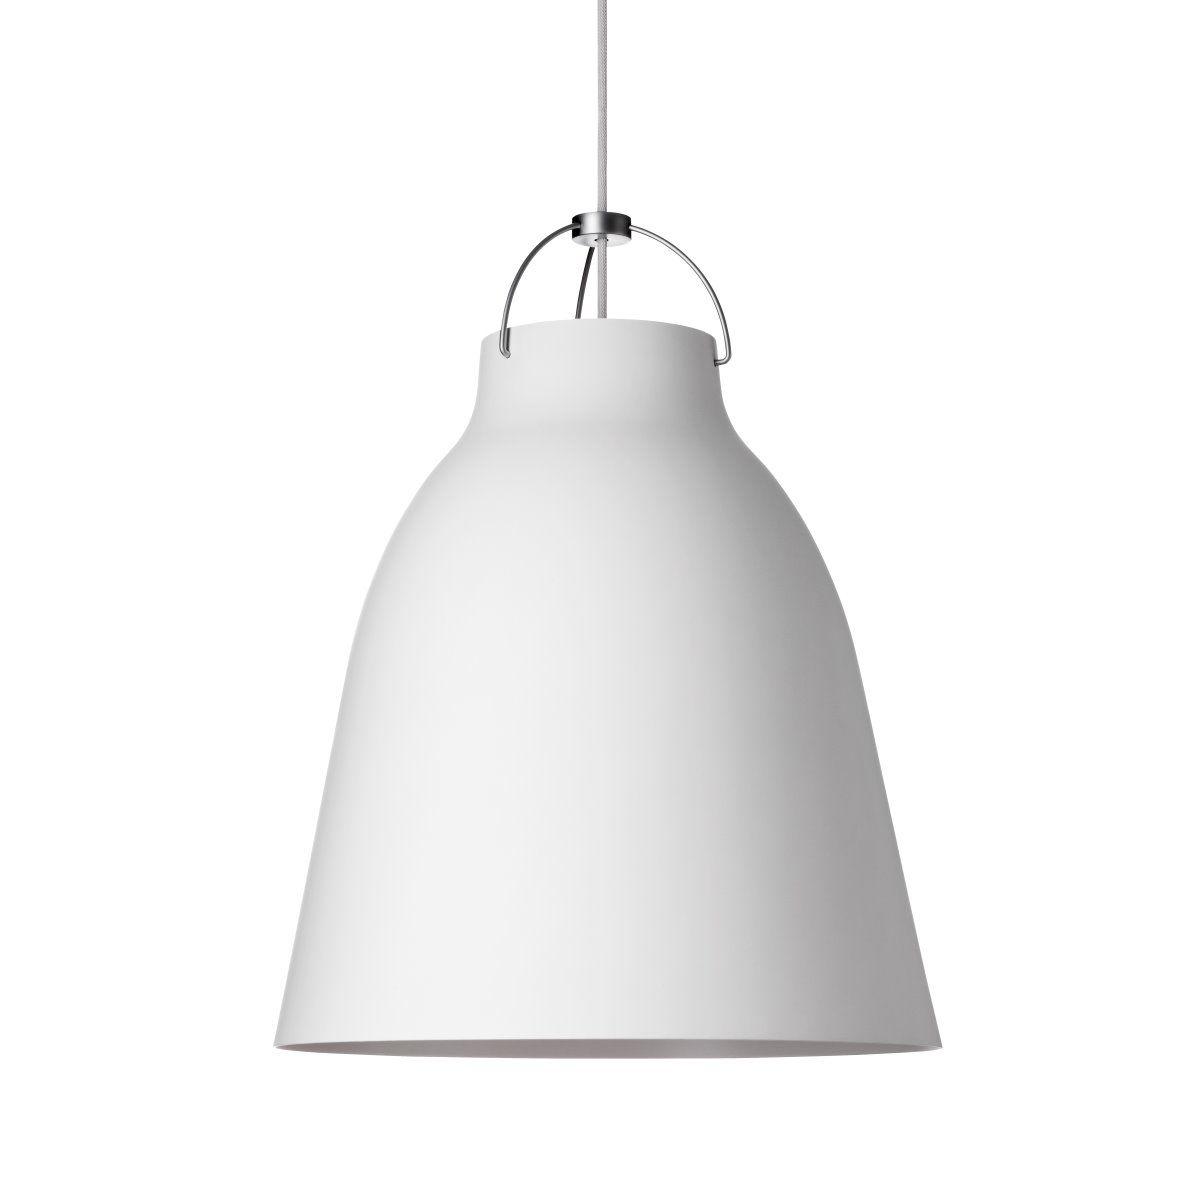 Caravaggio P3 Pendelleuchte Matt White Deckenlampe Schwarz Led Strahler Kristall Lampe